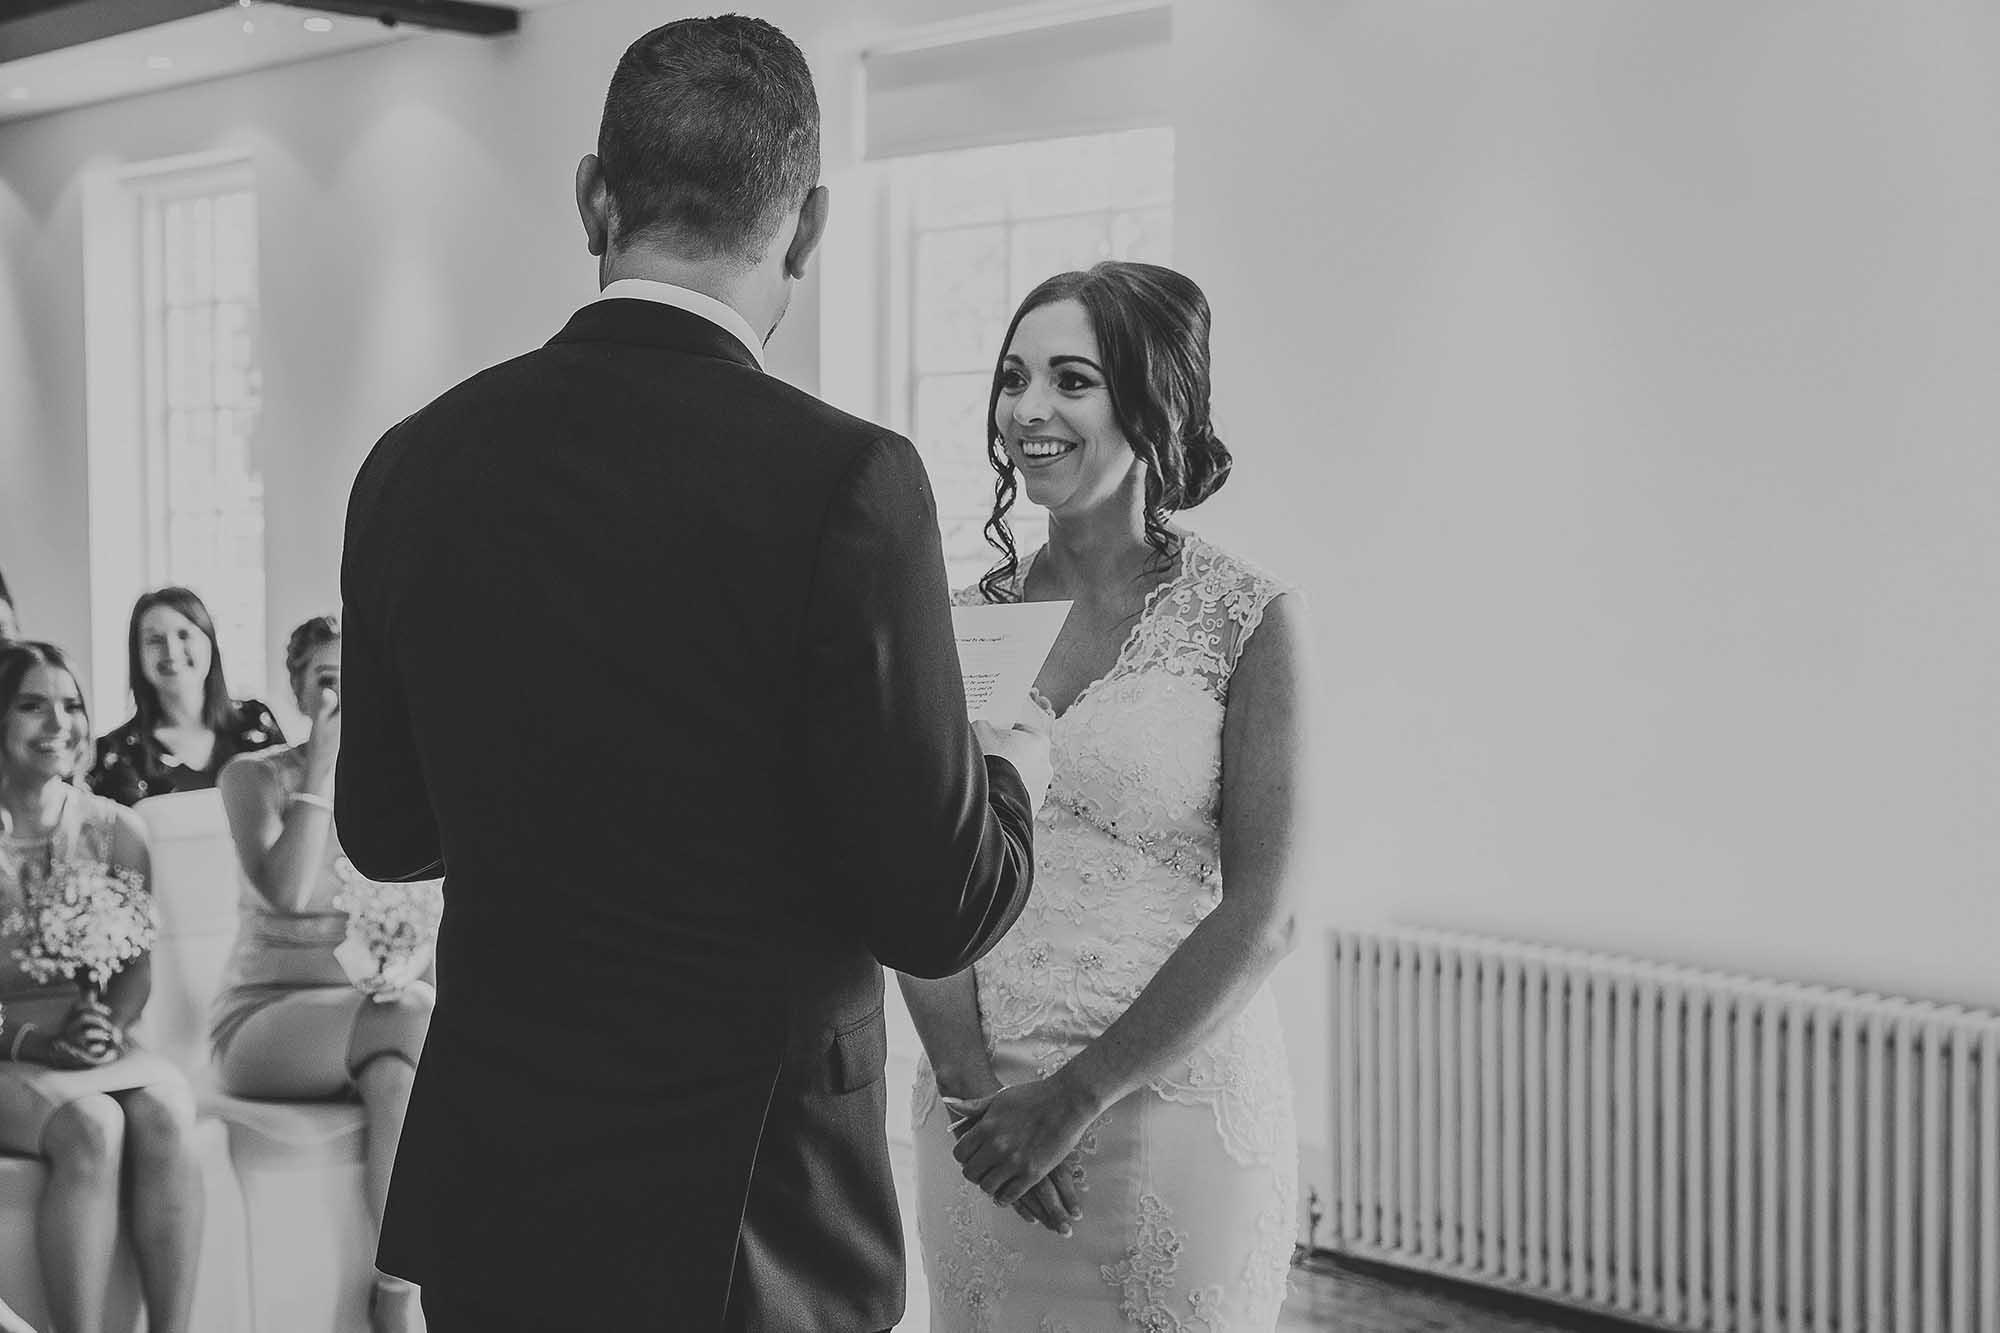 The Castlefield Rooms wedding service